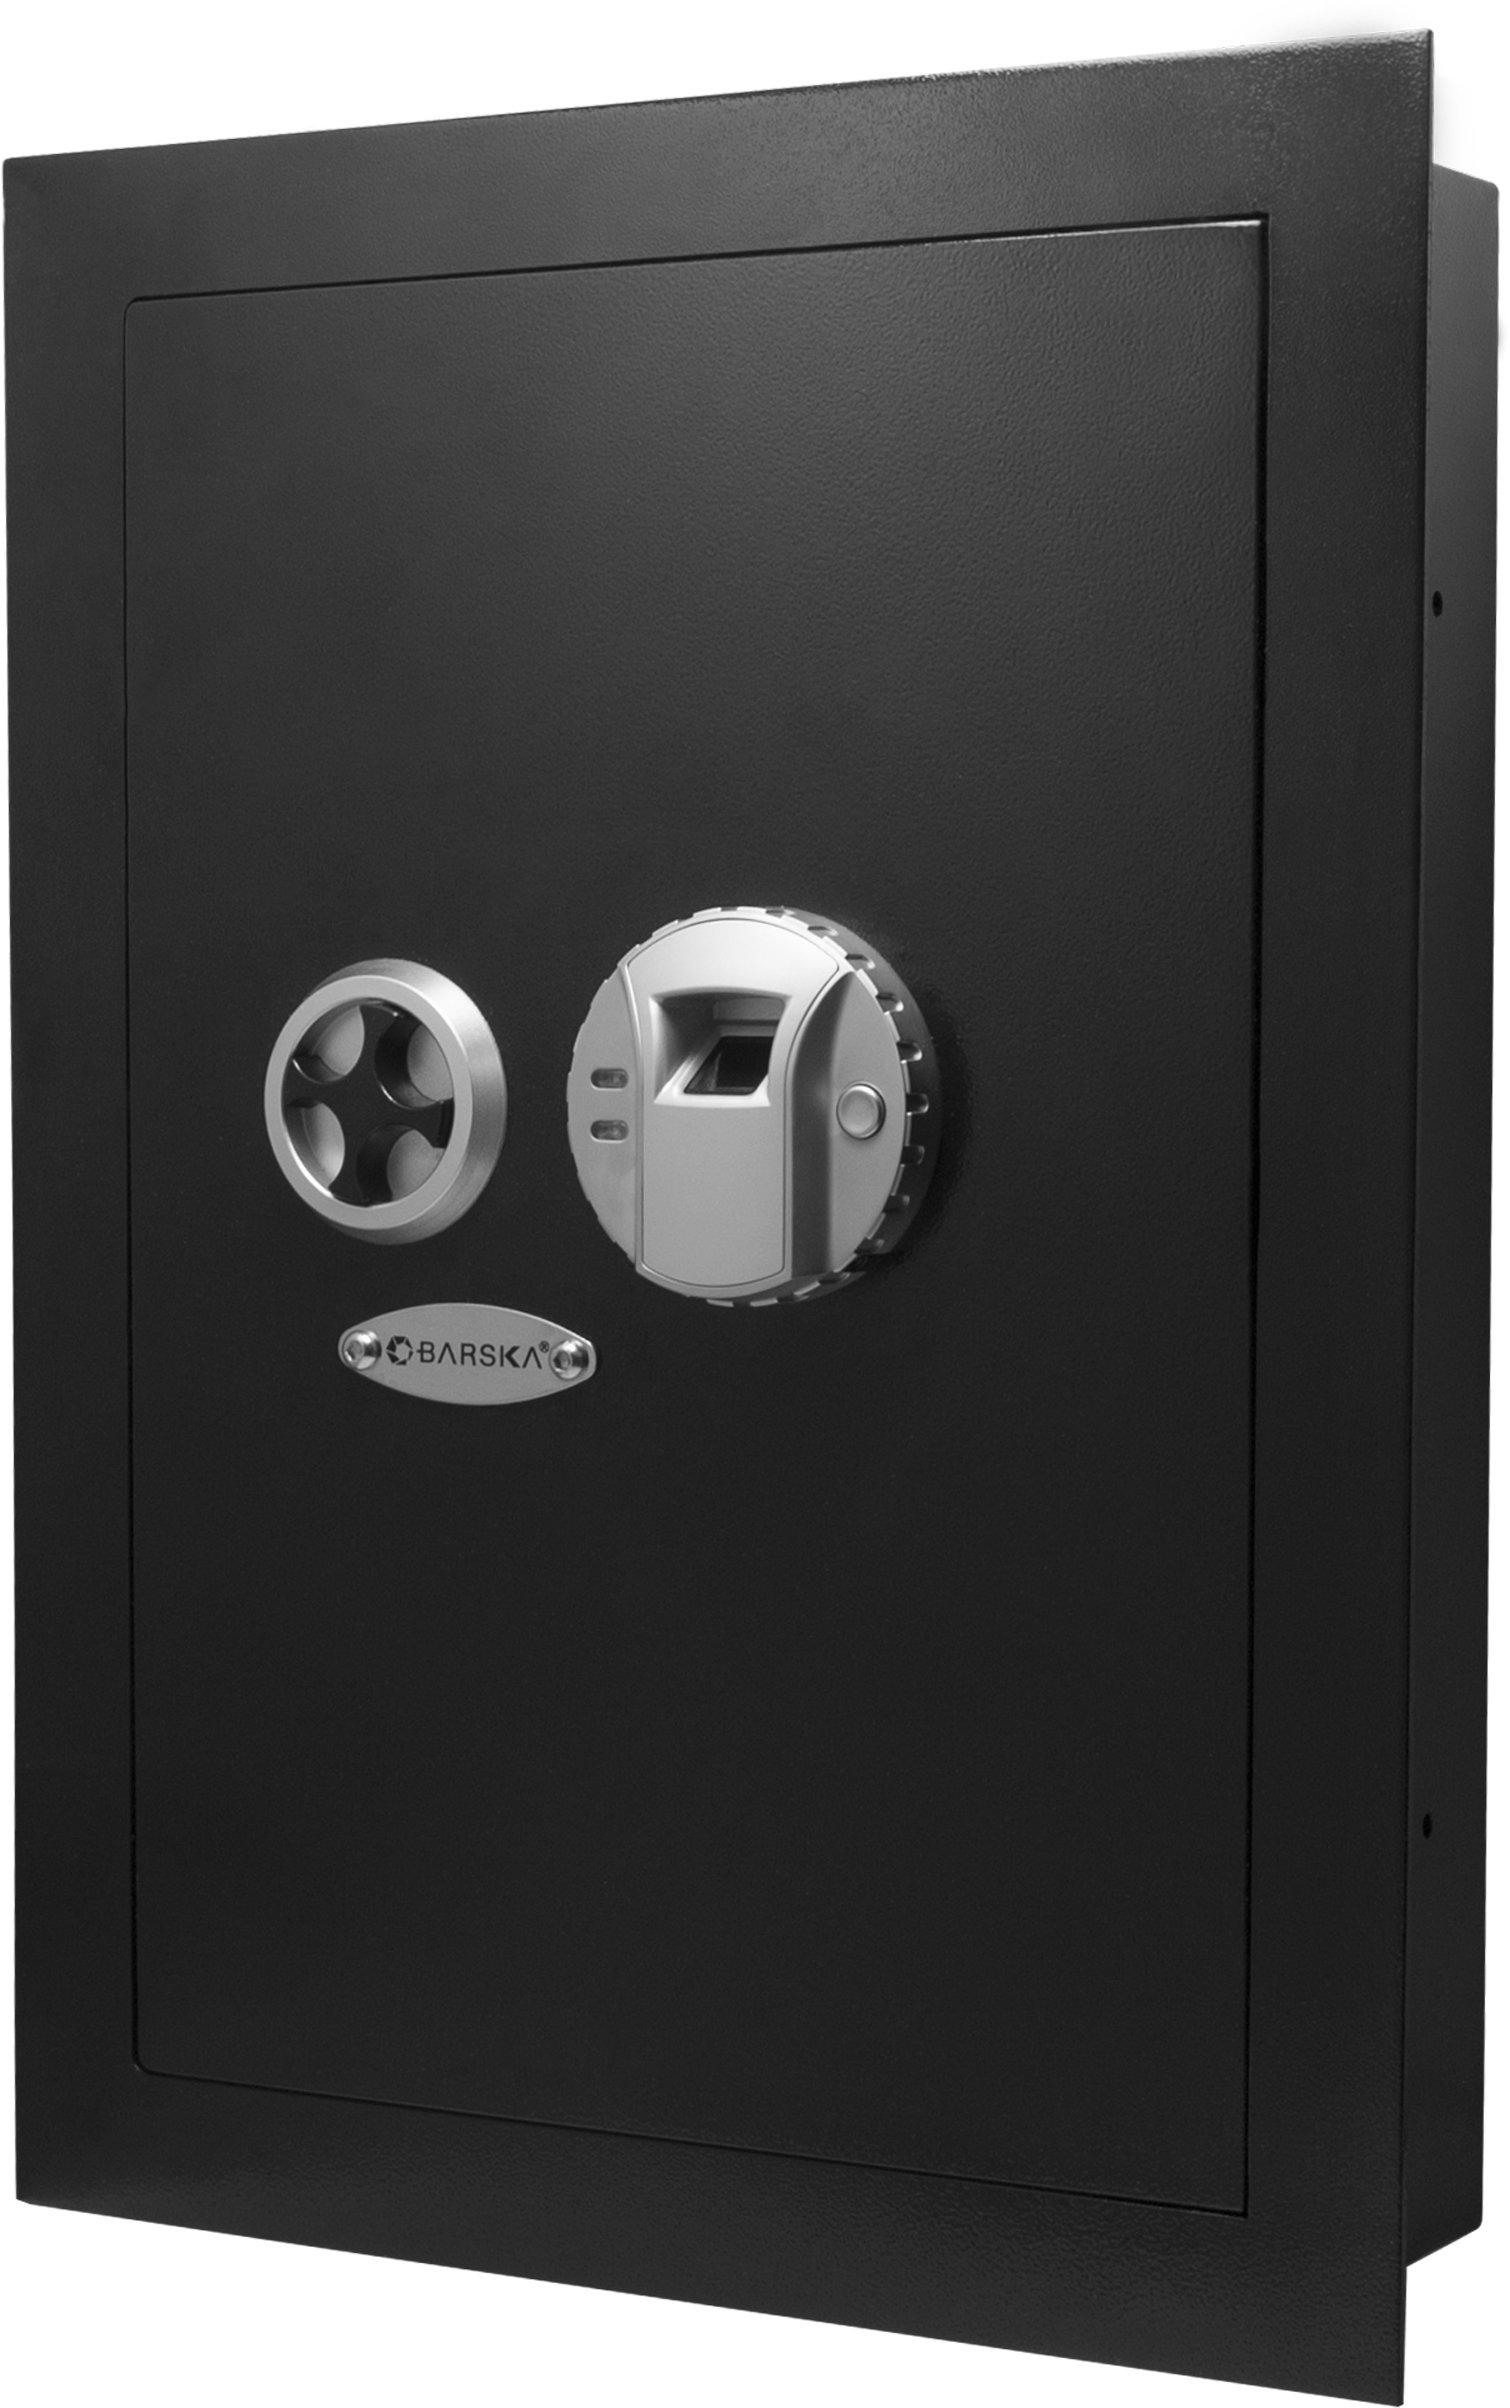 Barska Biometric Fingerprint Security Wall Safe 0.52 Cubic Ft by BARSKA